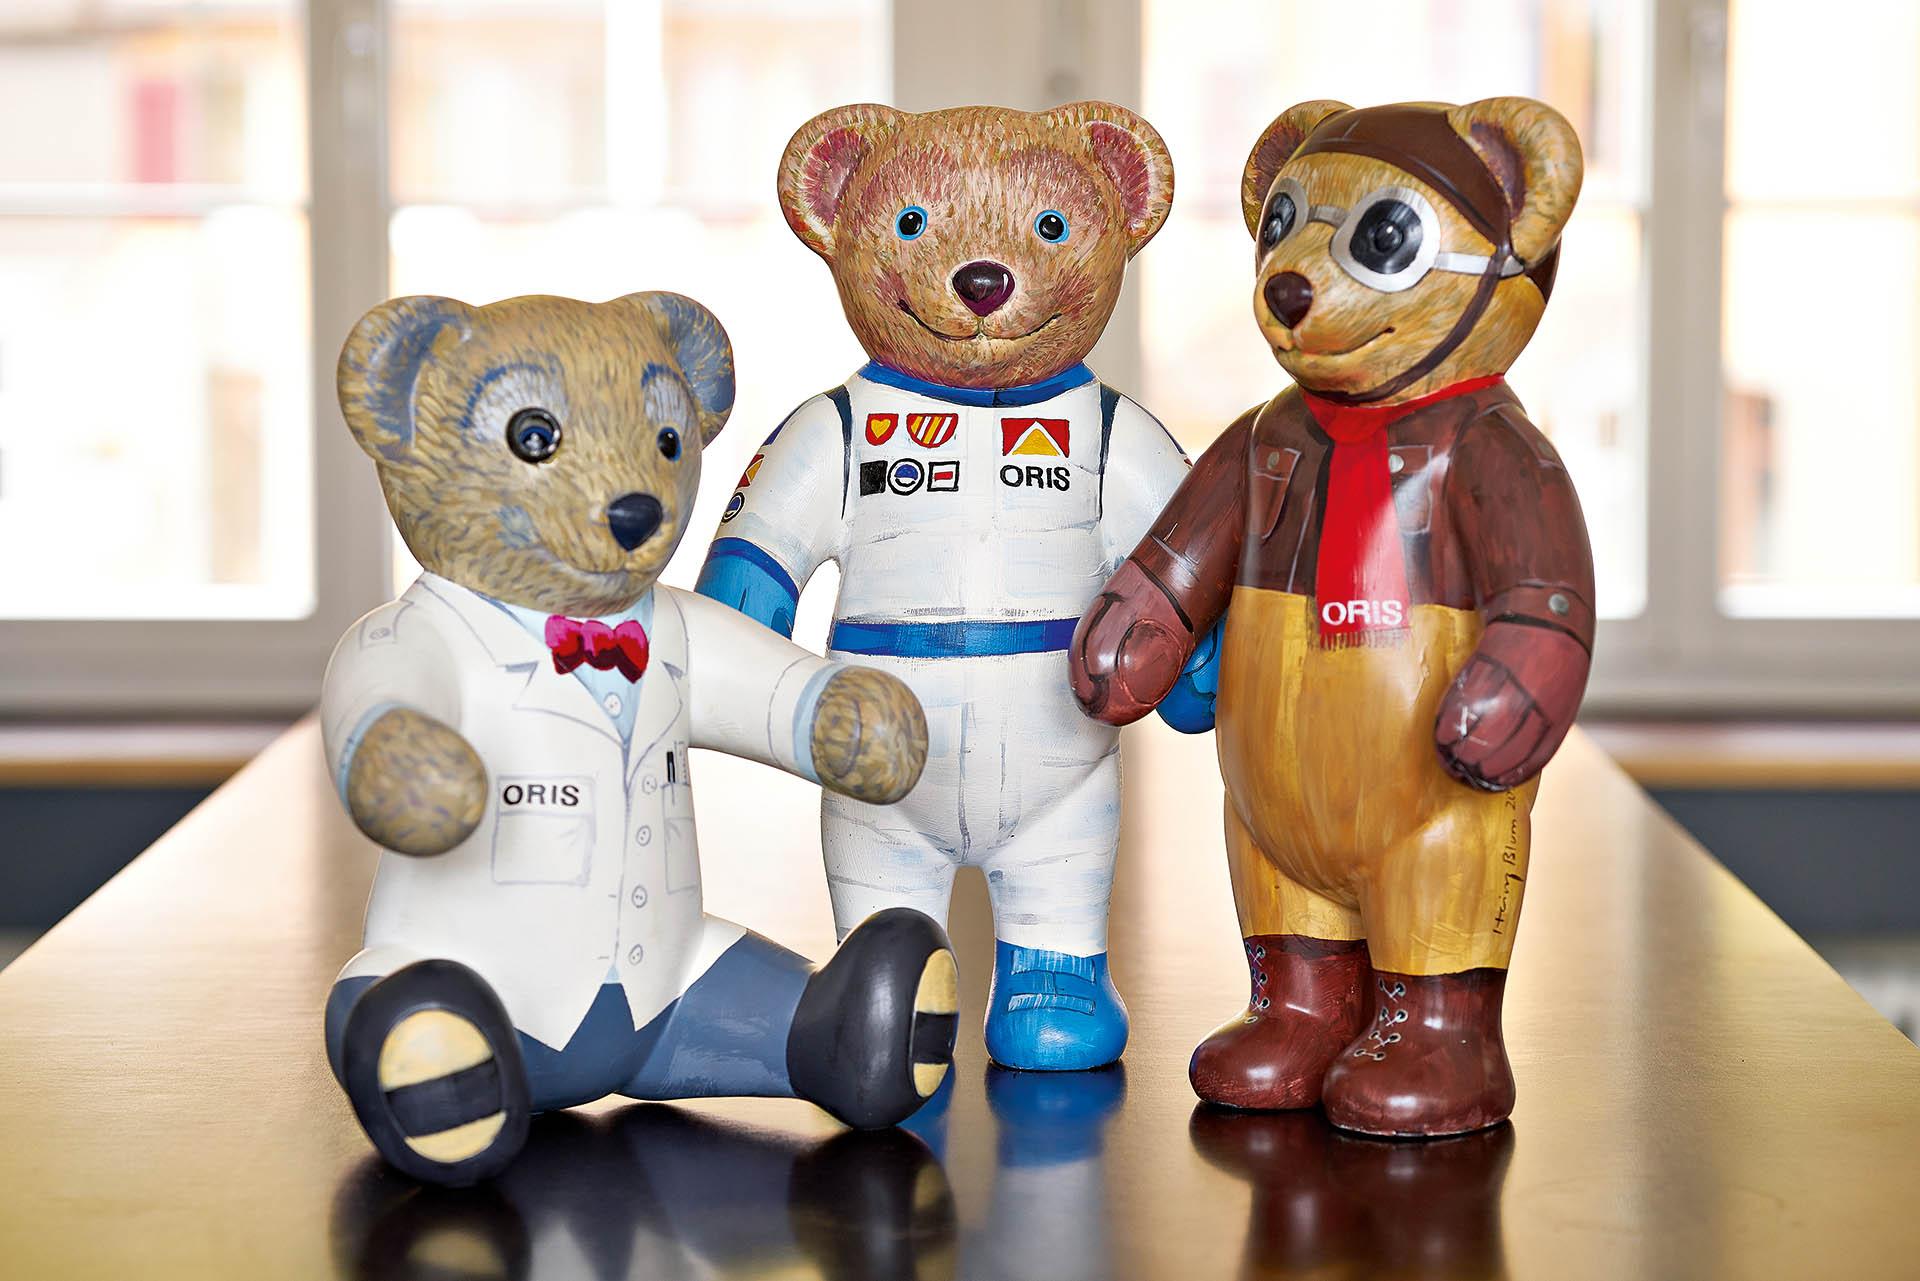 Oris Bären, Uhrenhersteller